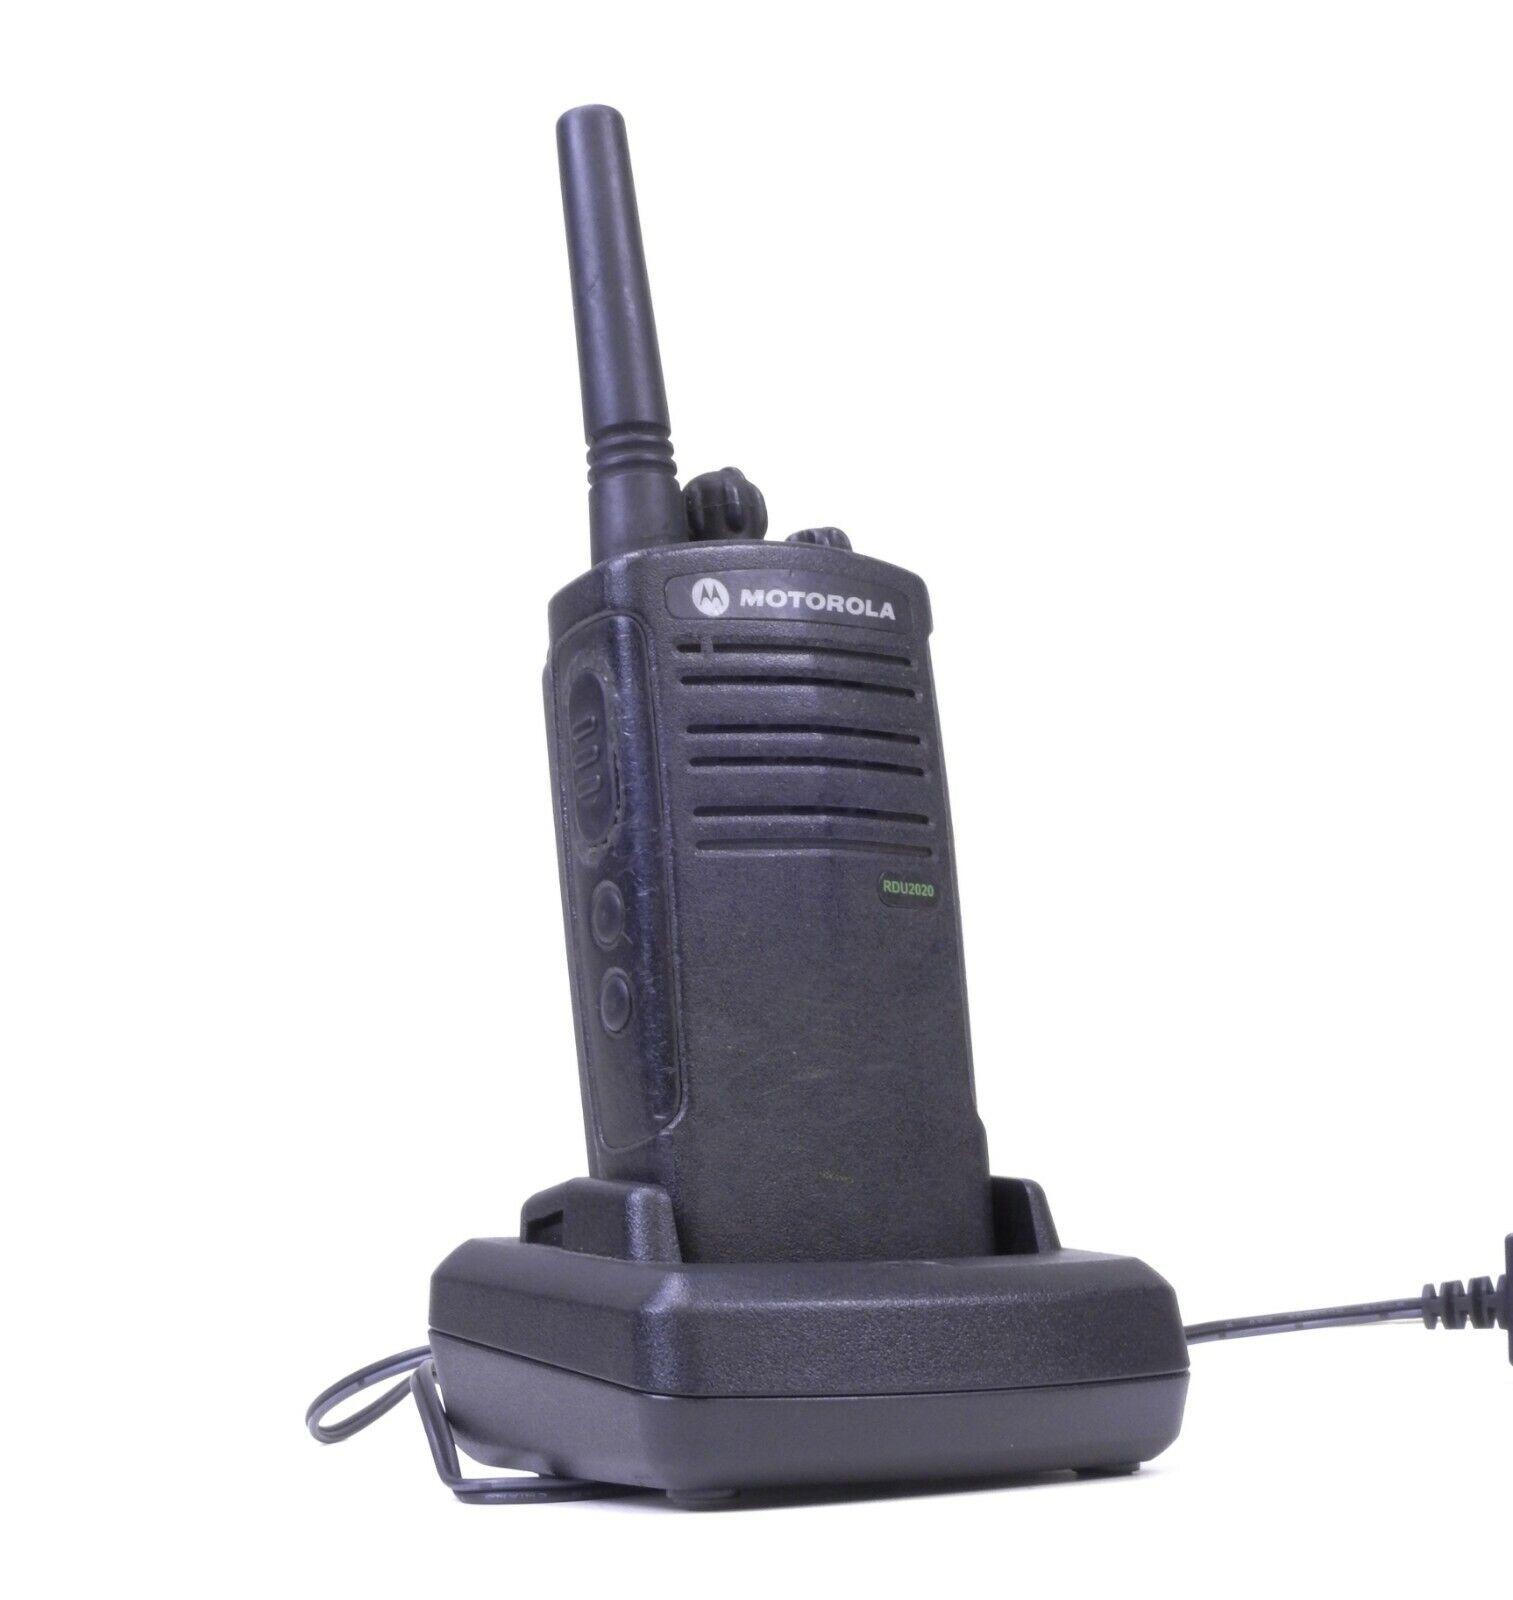 Motorola RDU2020 On-Site